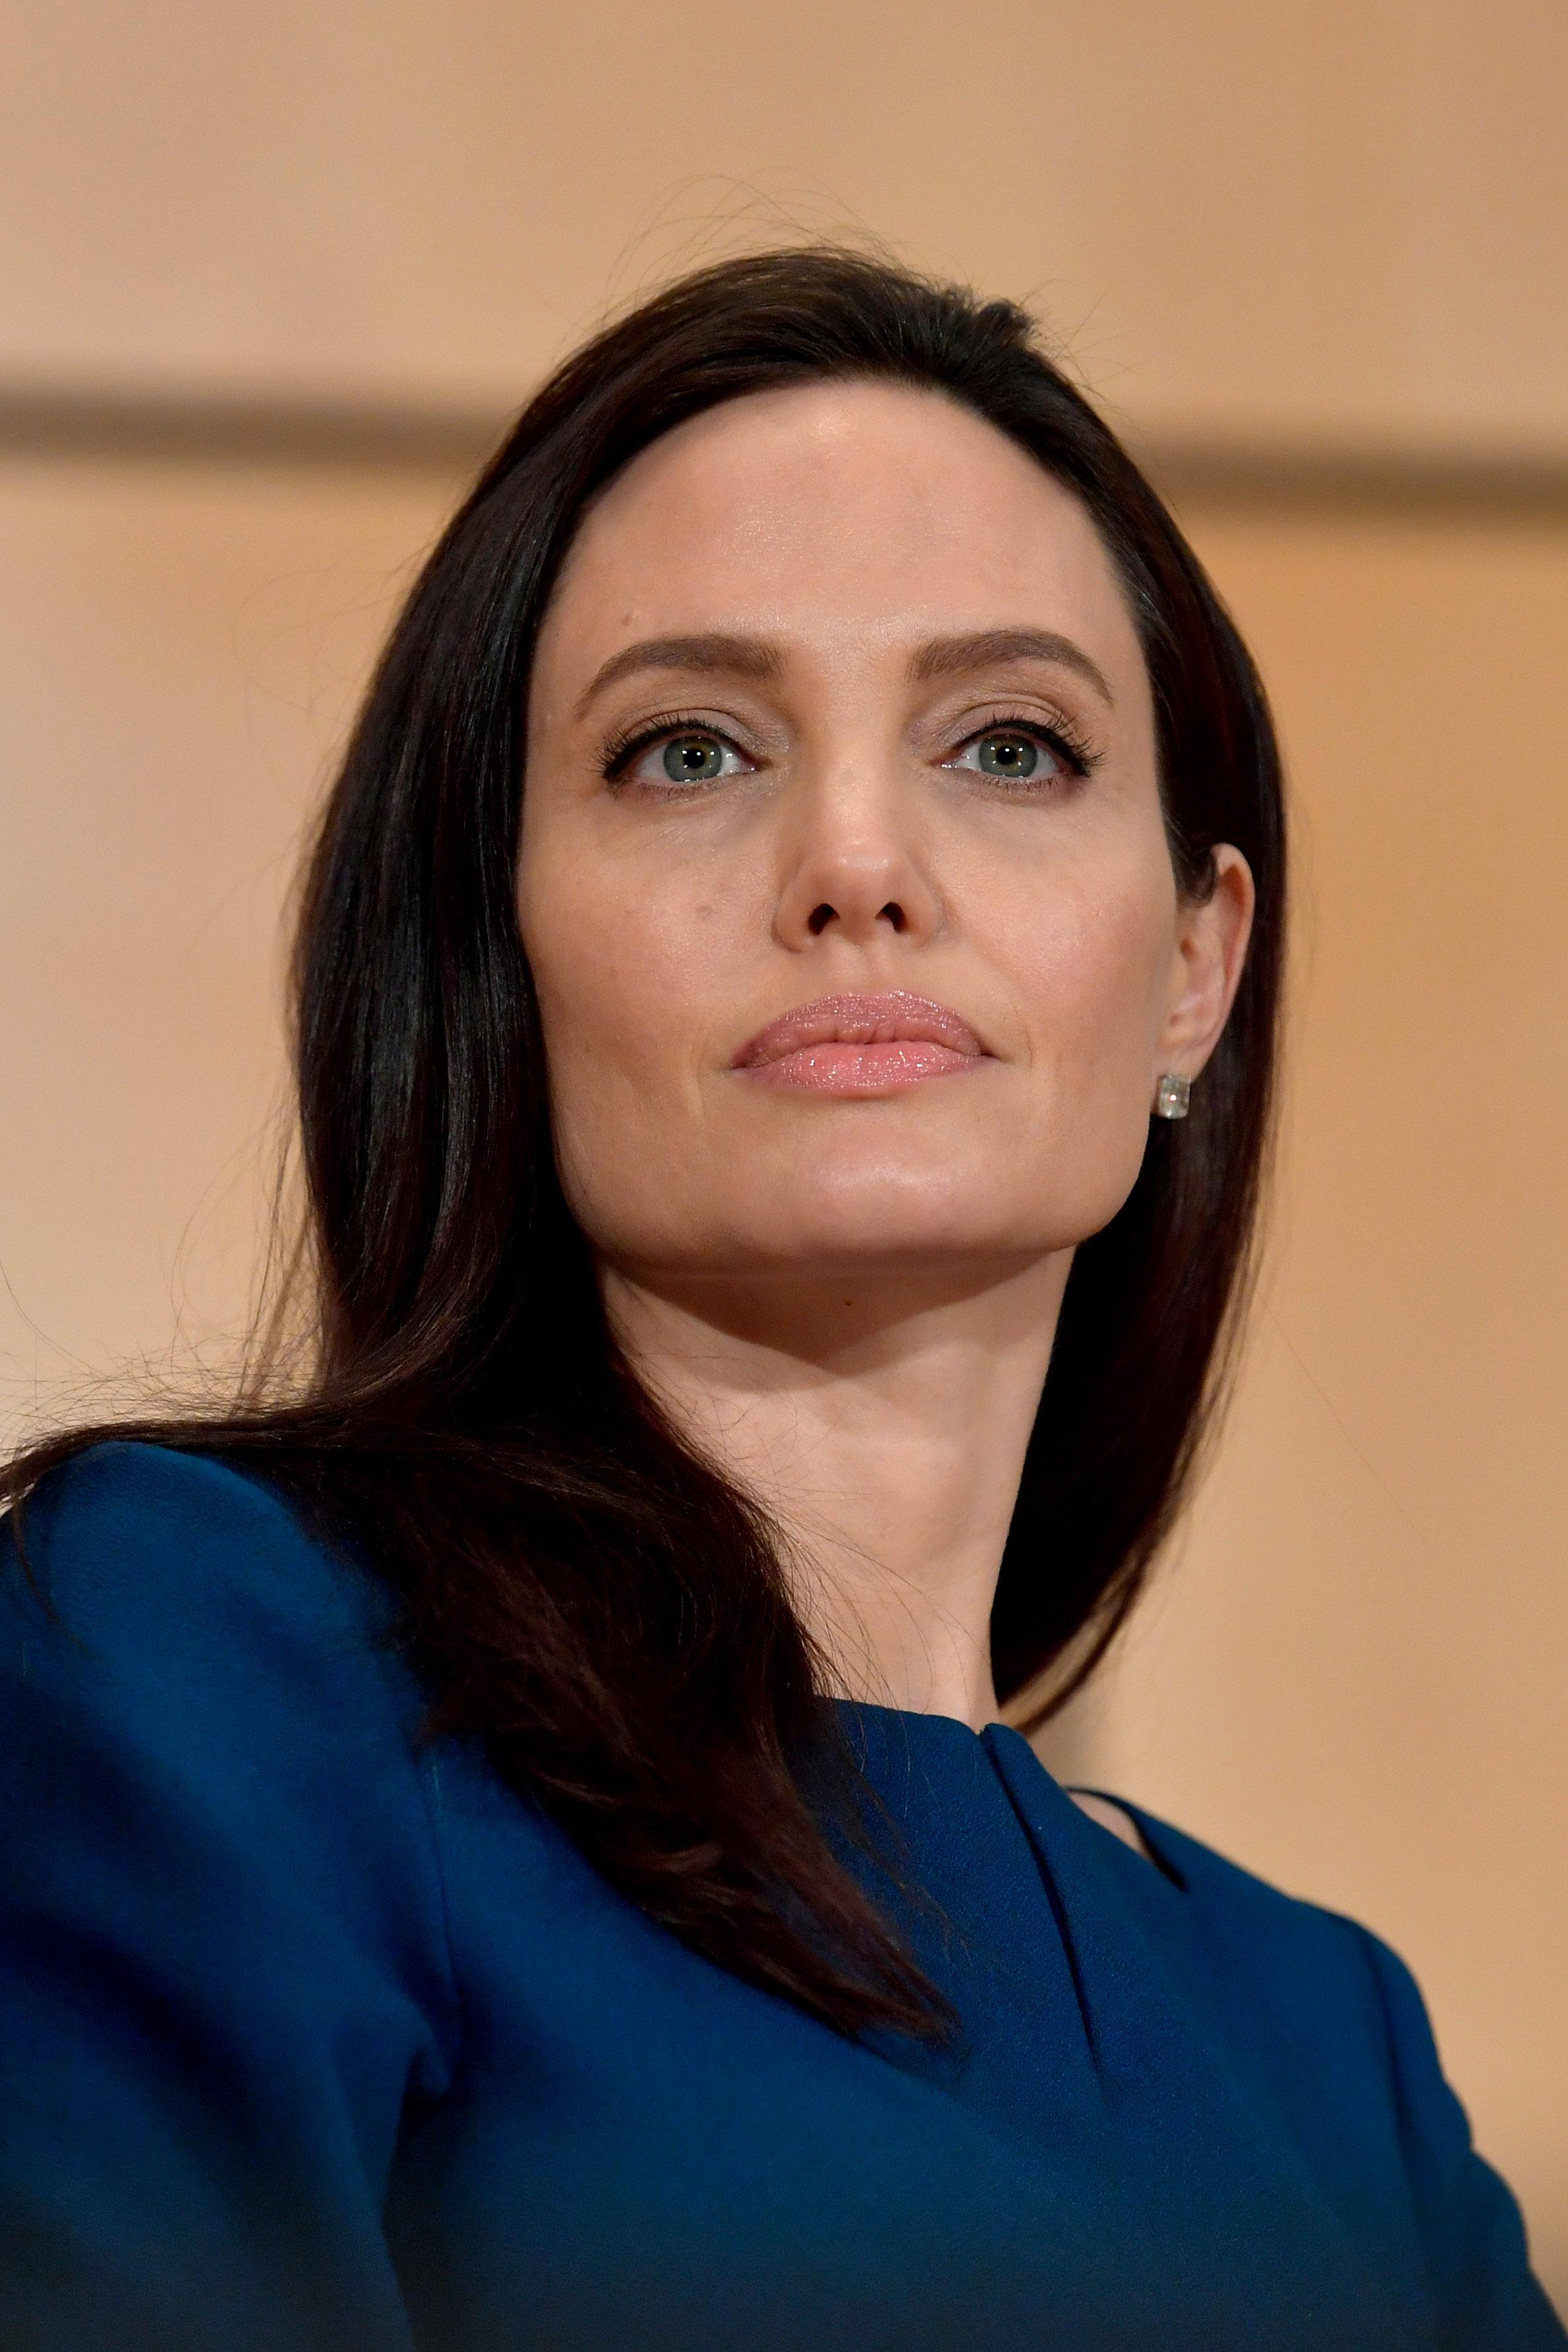 Angolina Jolie, Brad Pitt, divorce